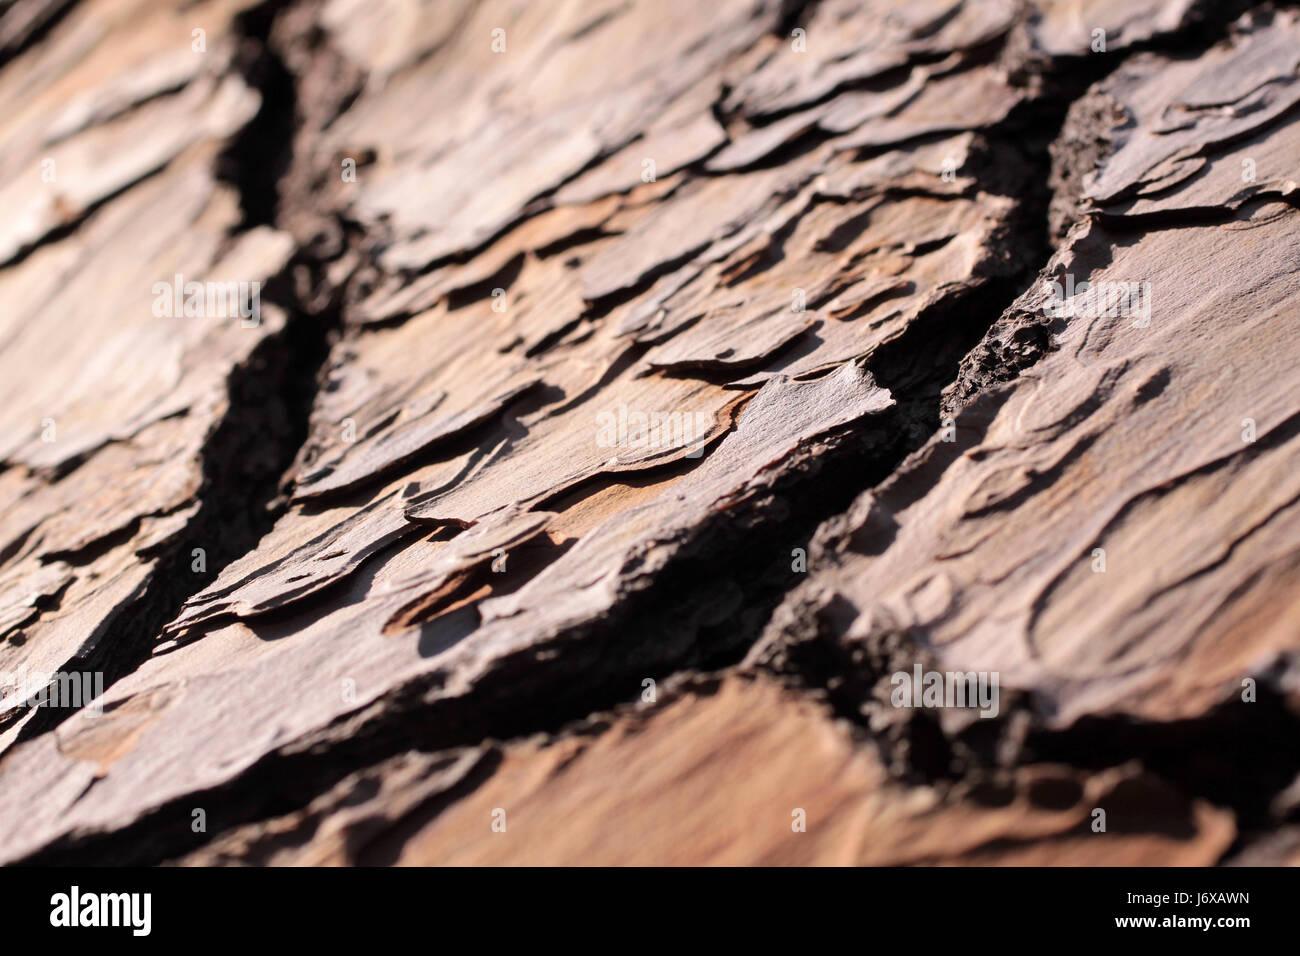 Bark Of A Pine Tree   Stock Image